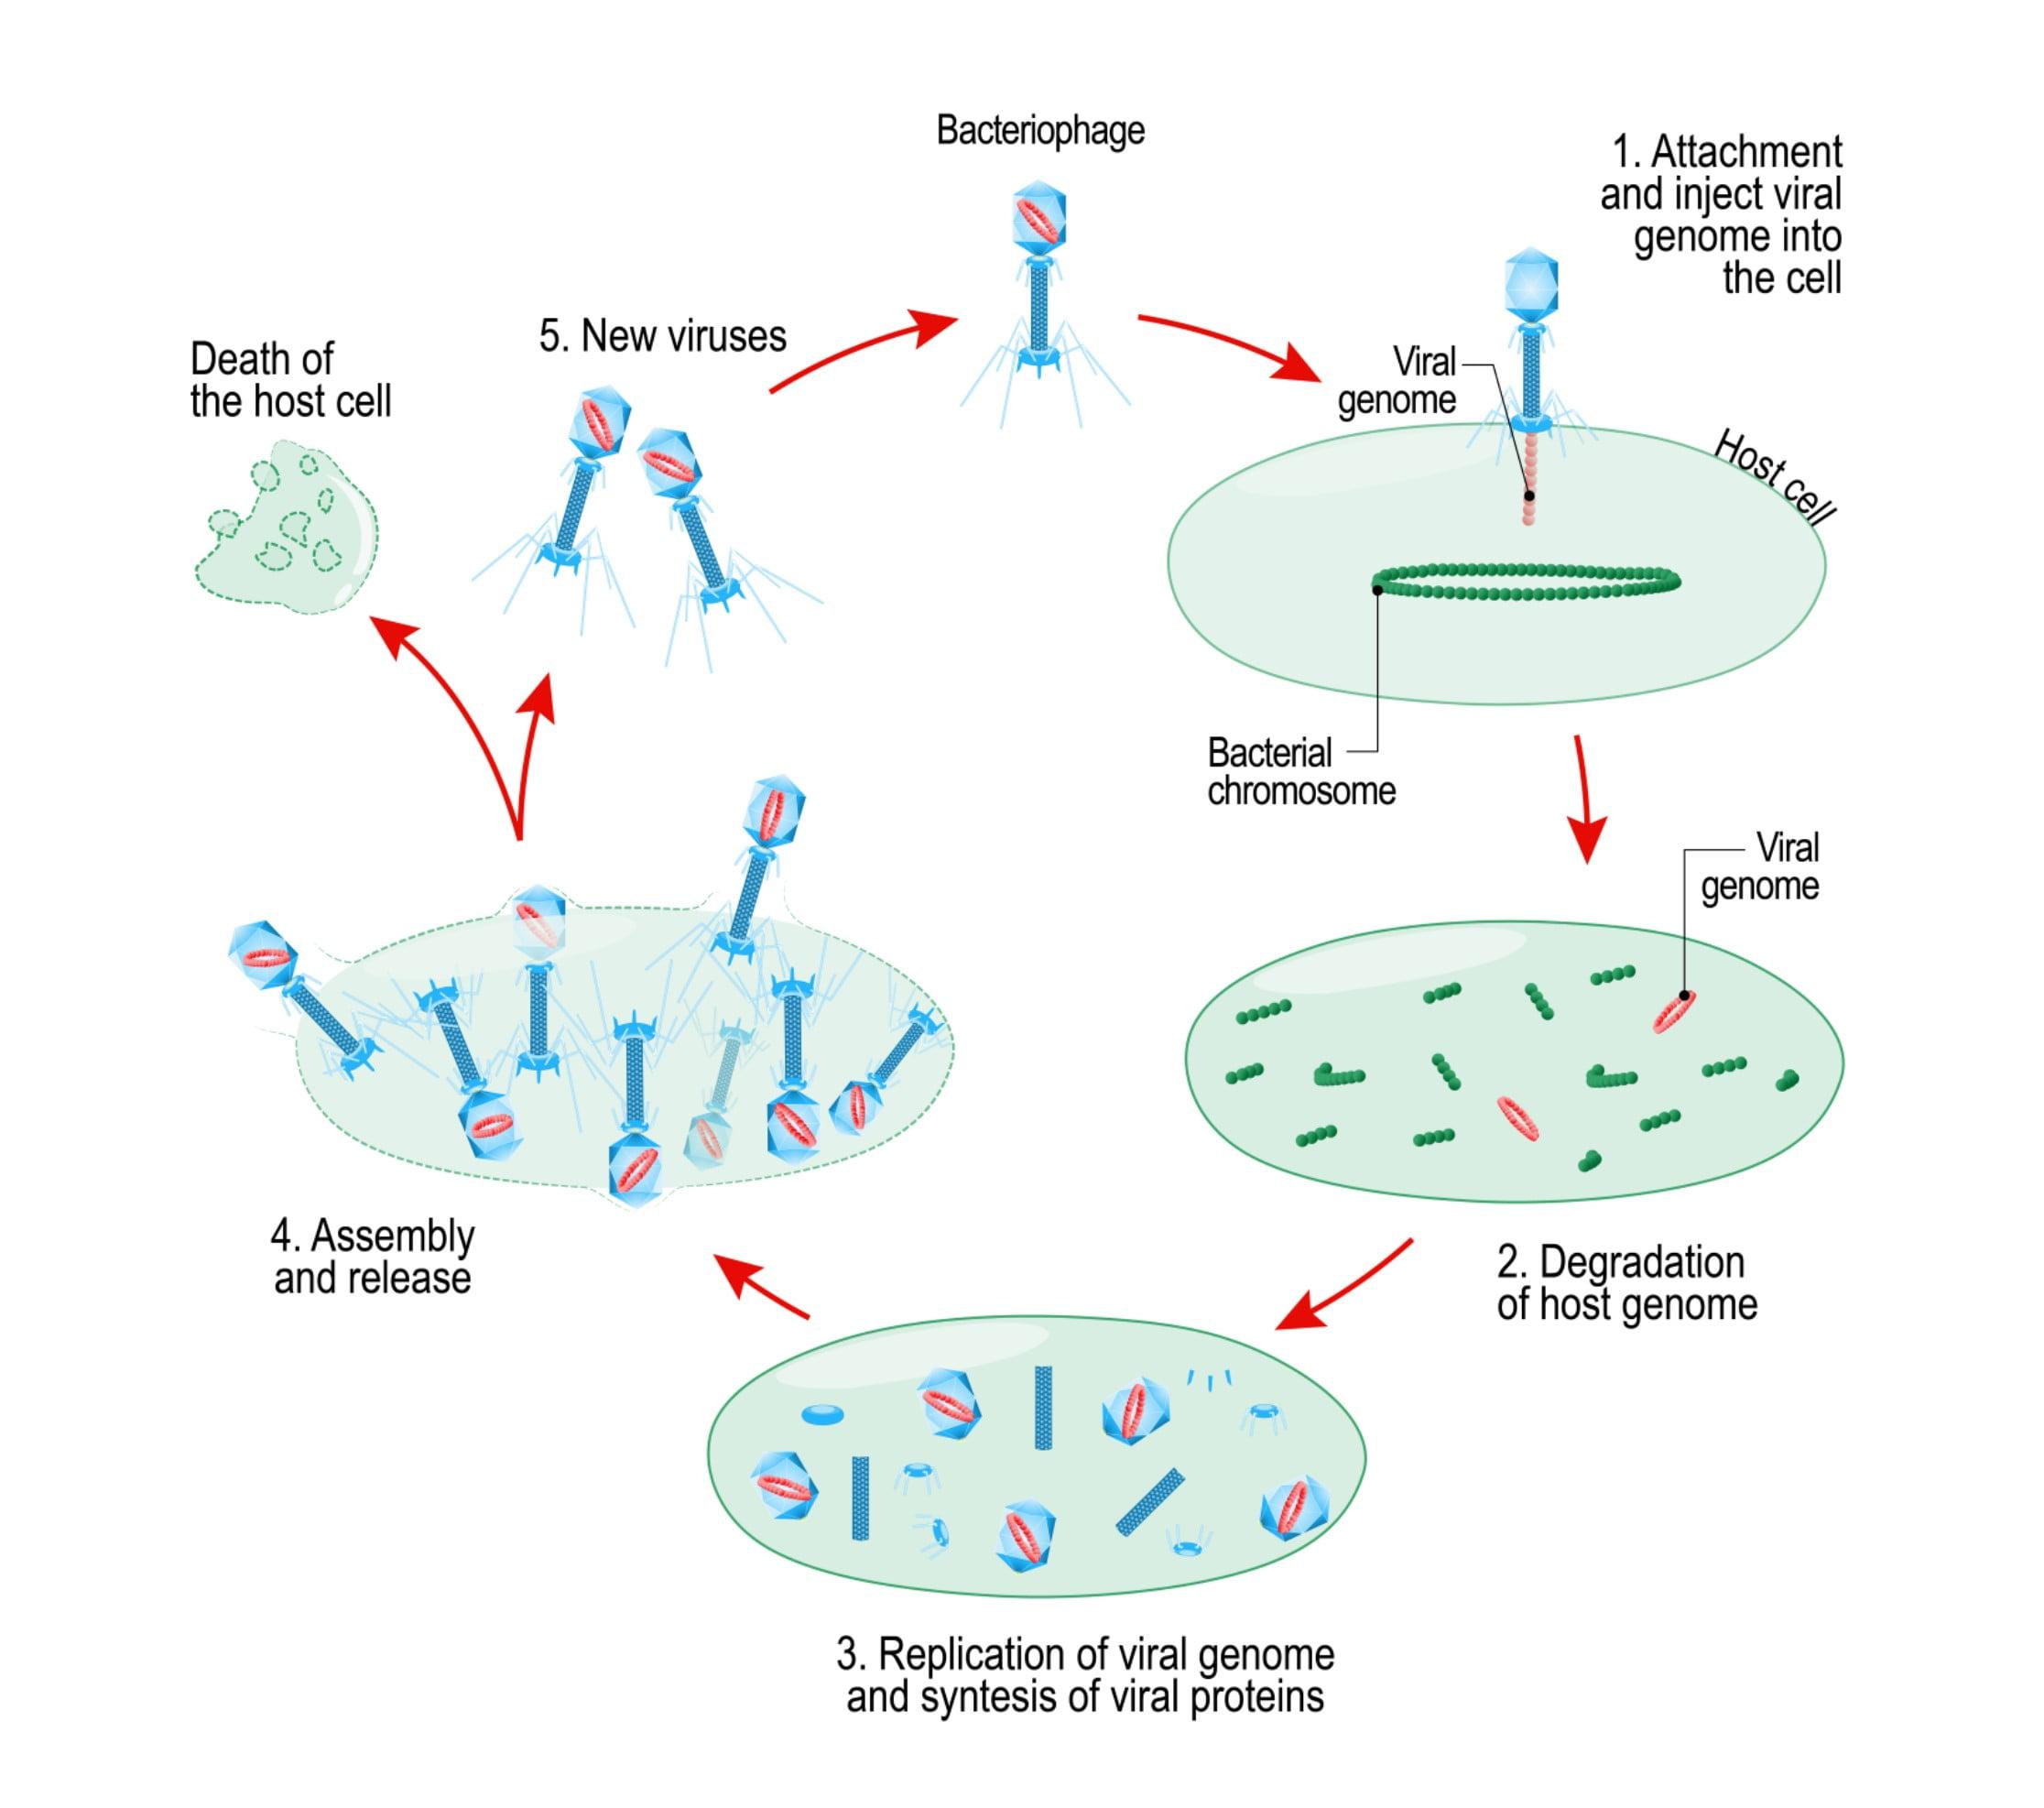 Virus reproduction